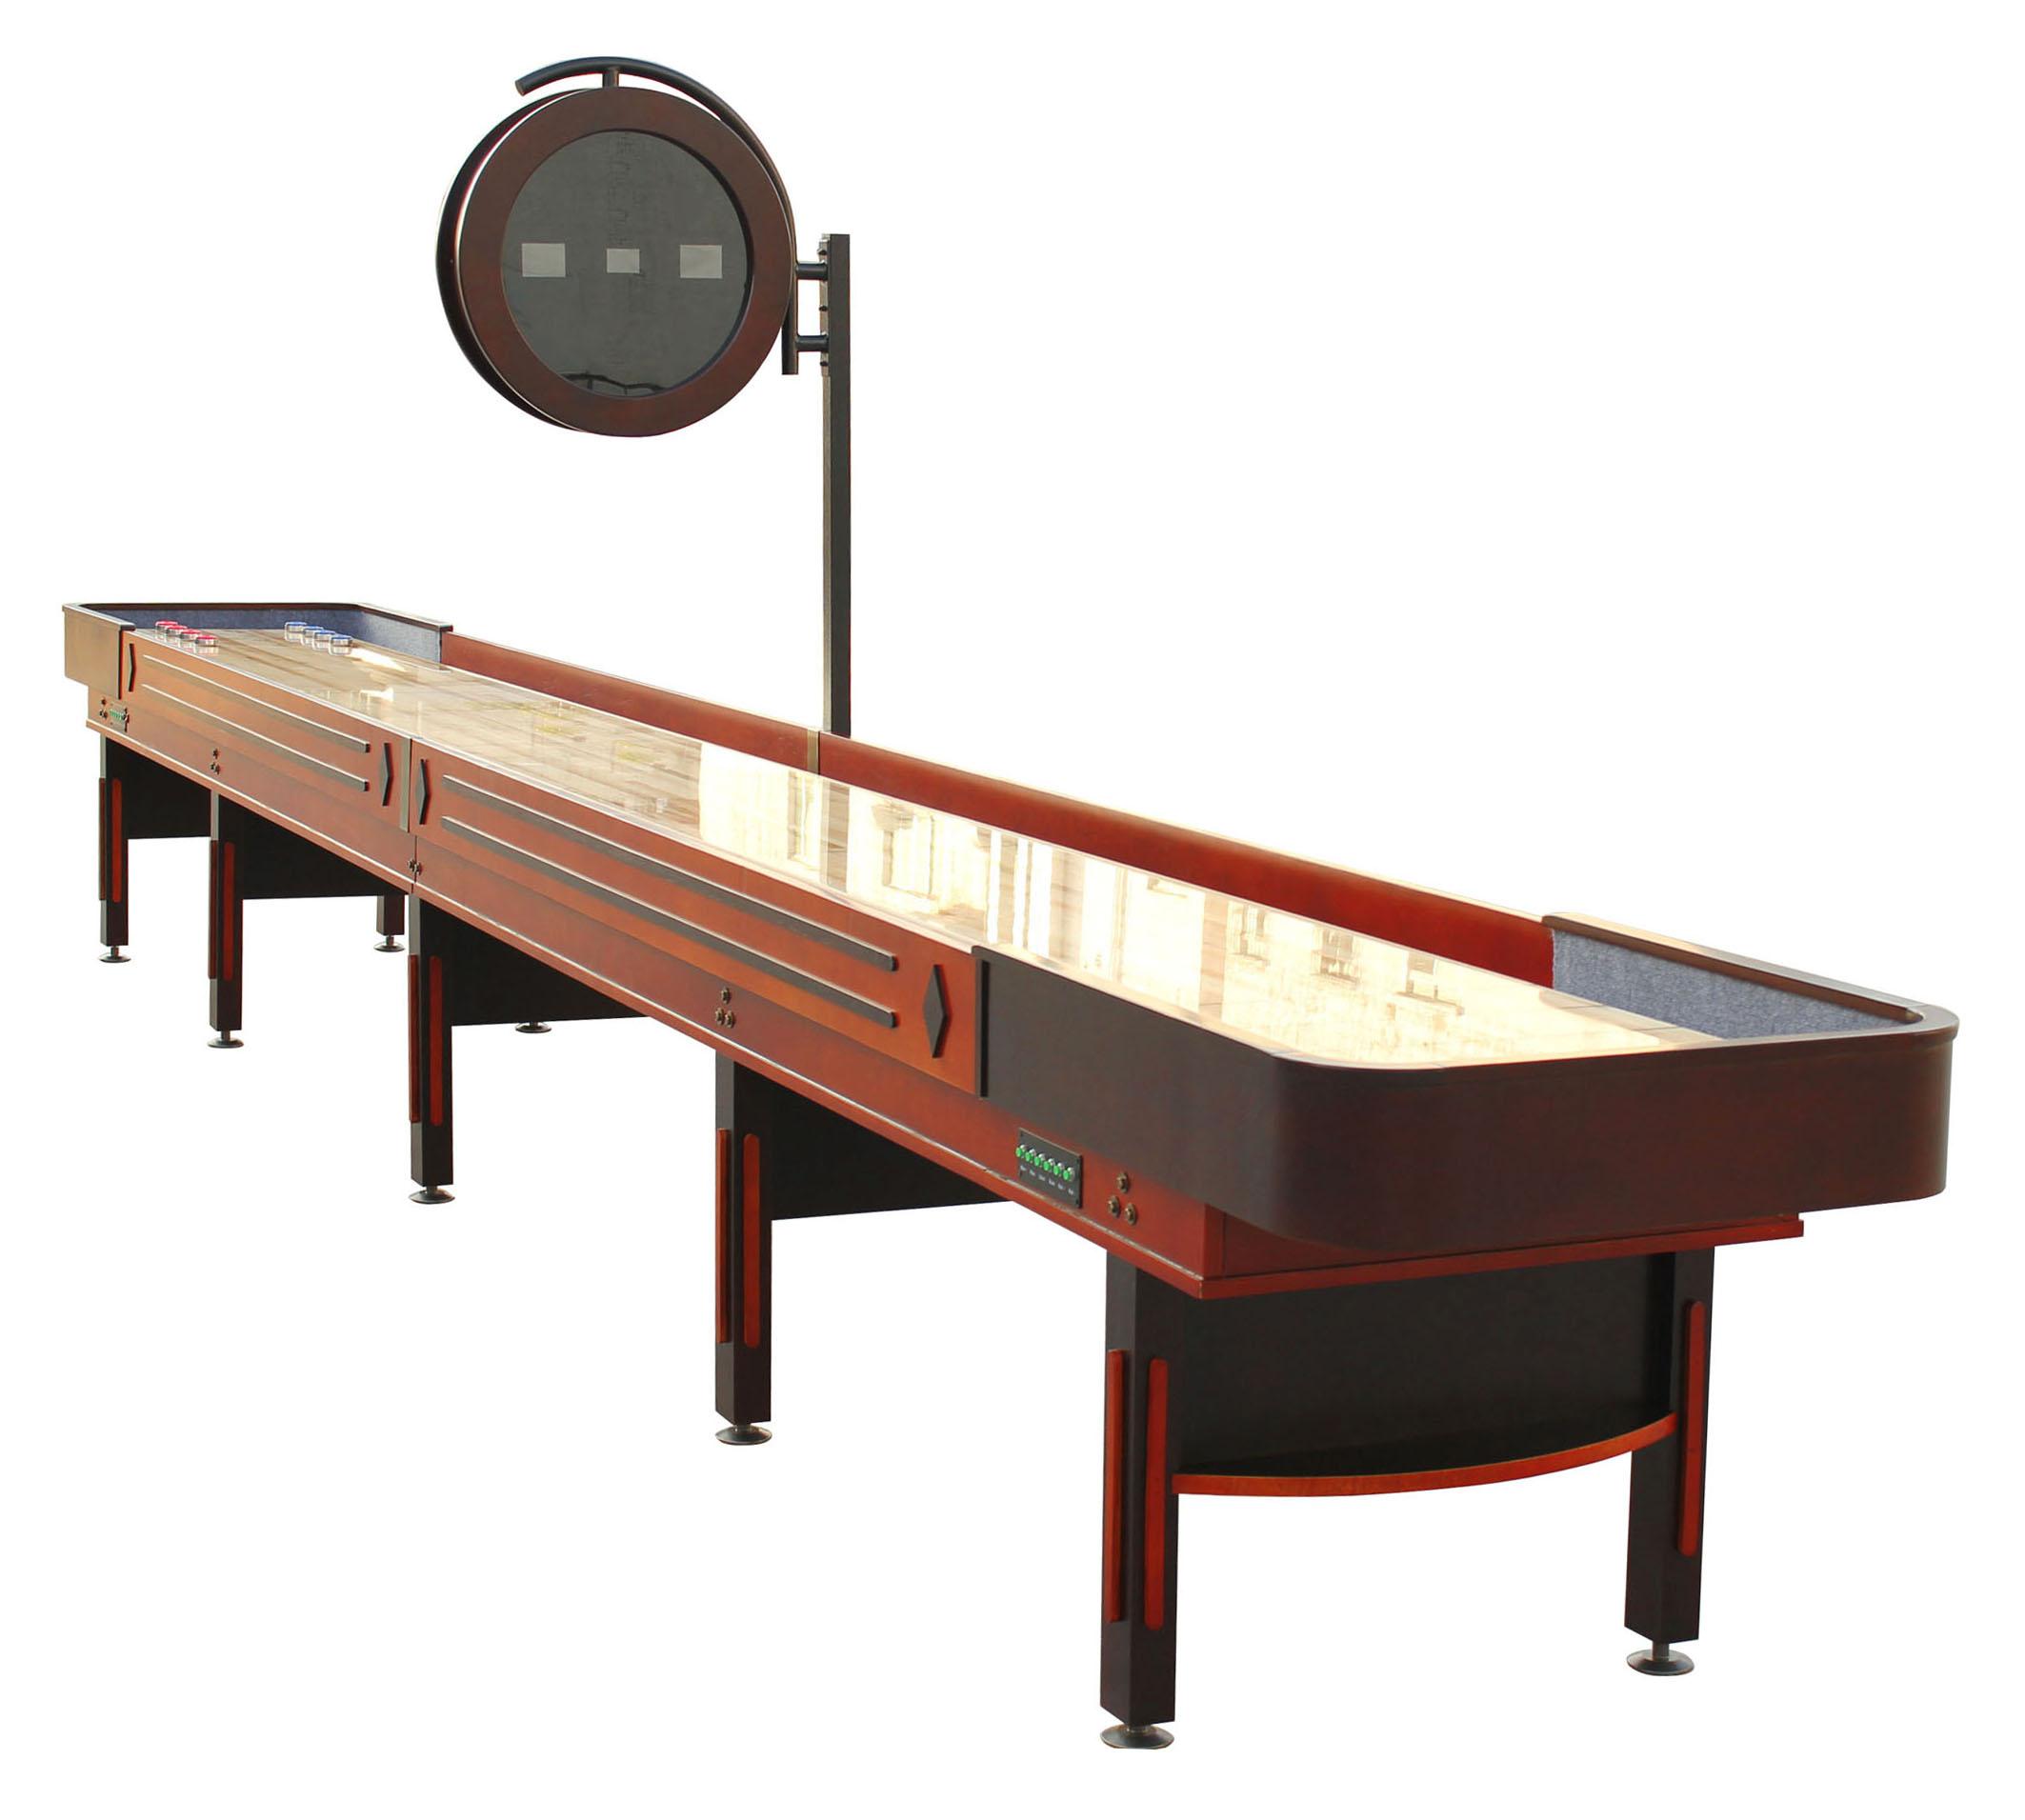 Nordic shuffleboard 12 fot Classic inklusive tilbehør